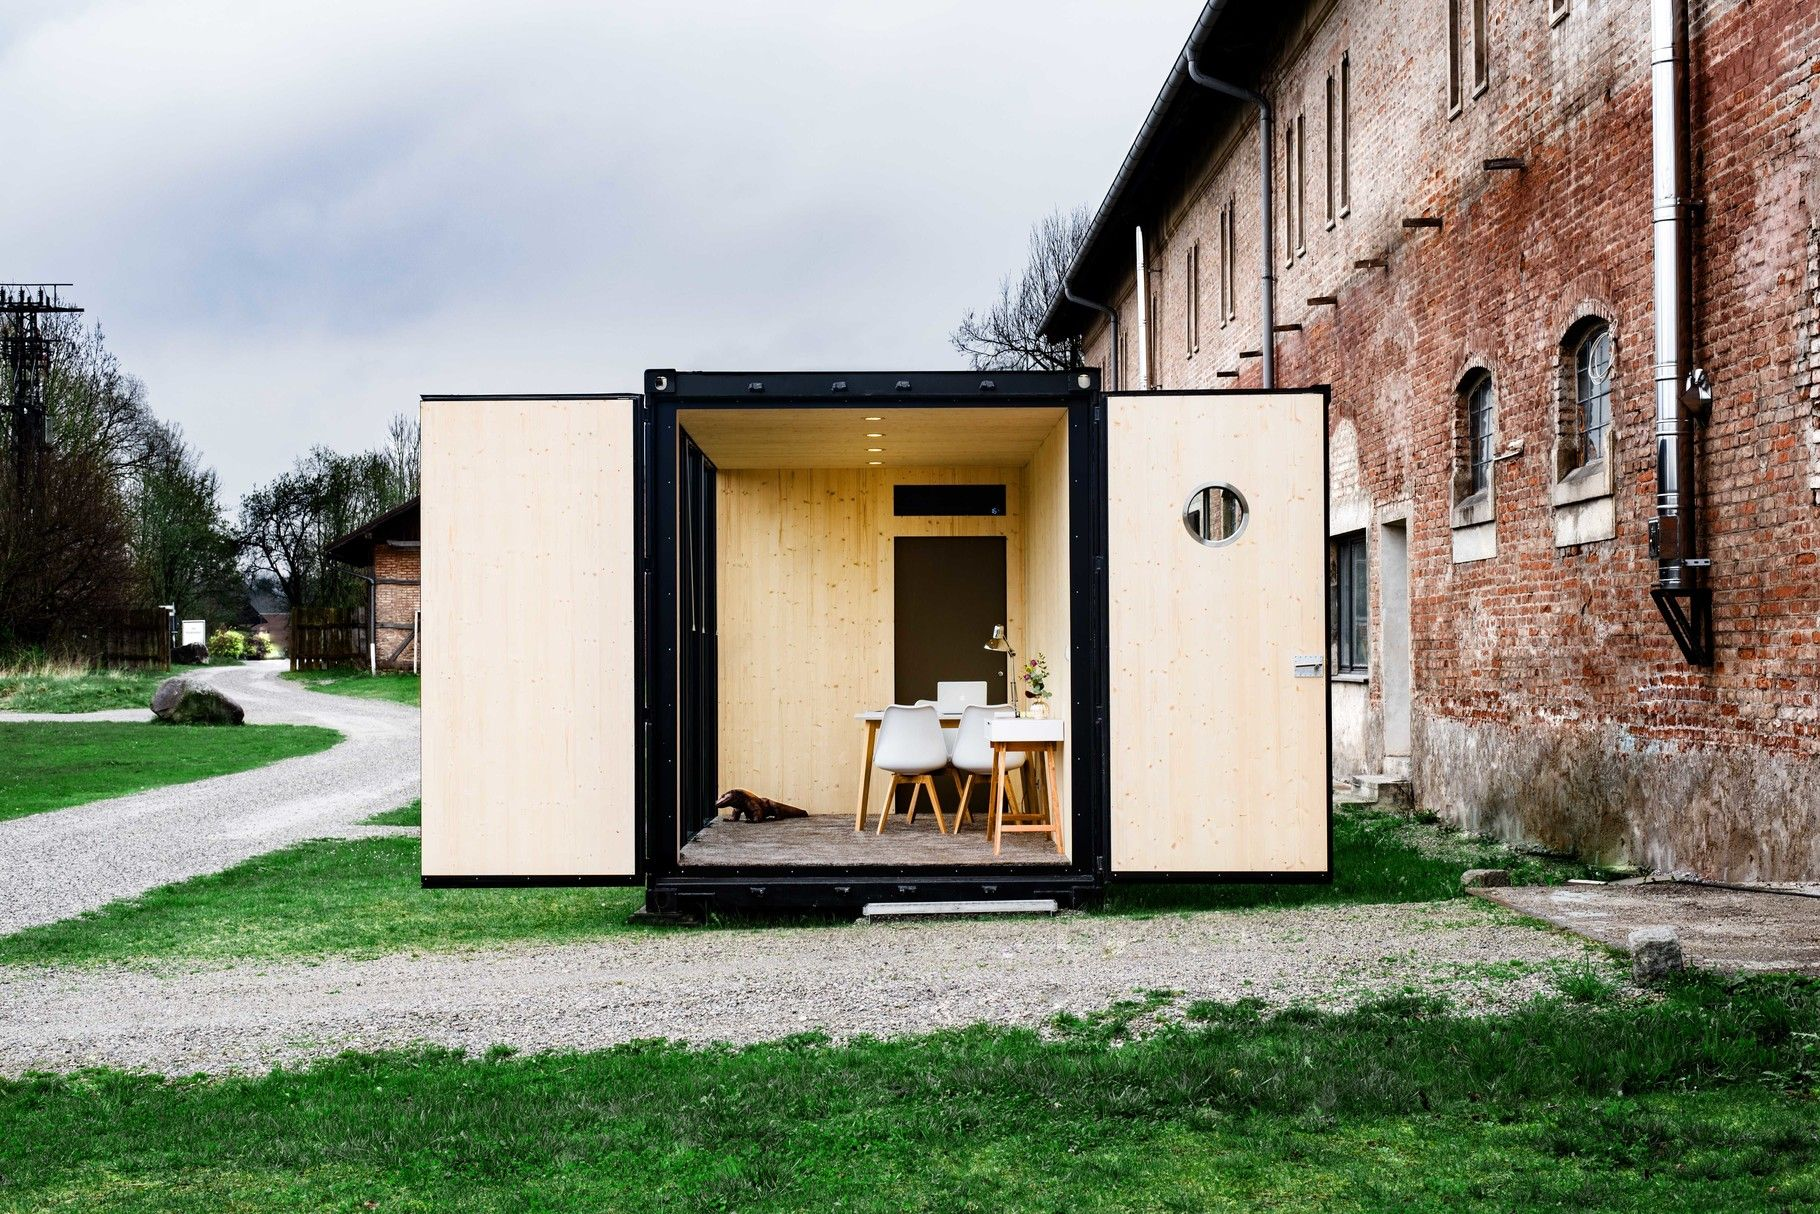 HiLoft - Hiloft - moderne Container Architektur | möbel | Pinterest ...